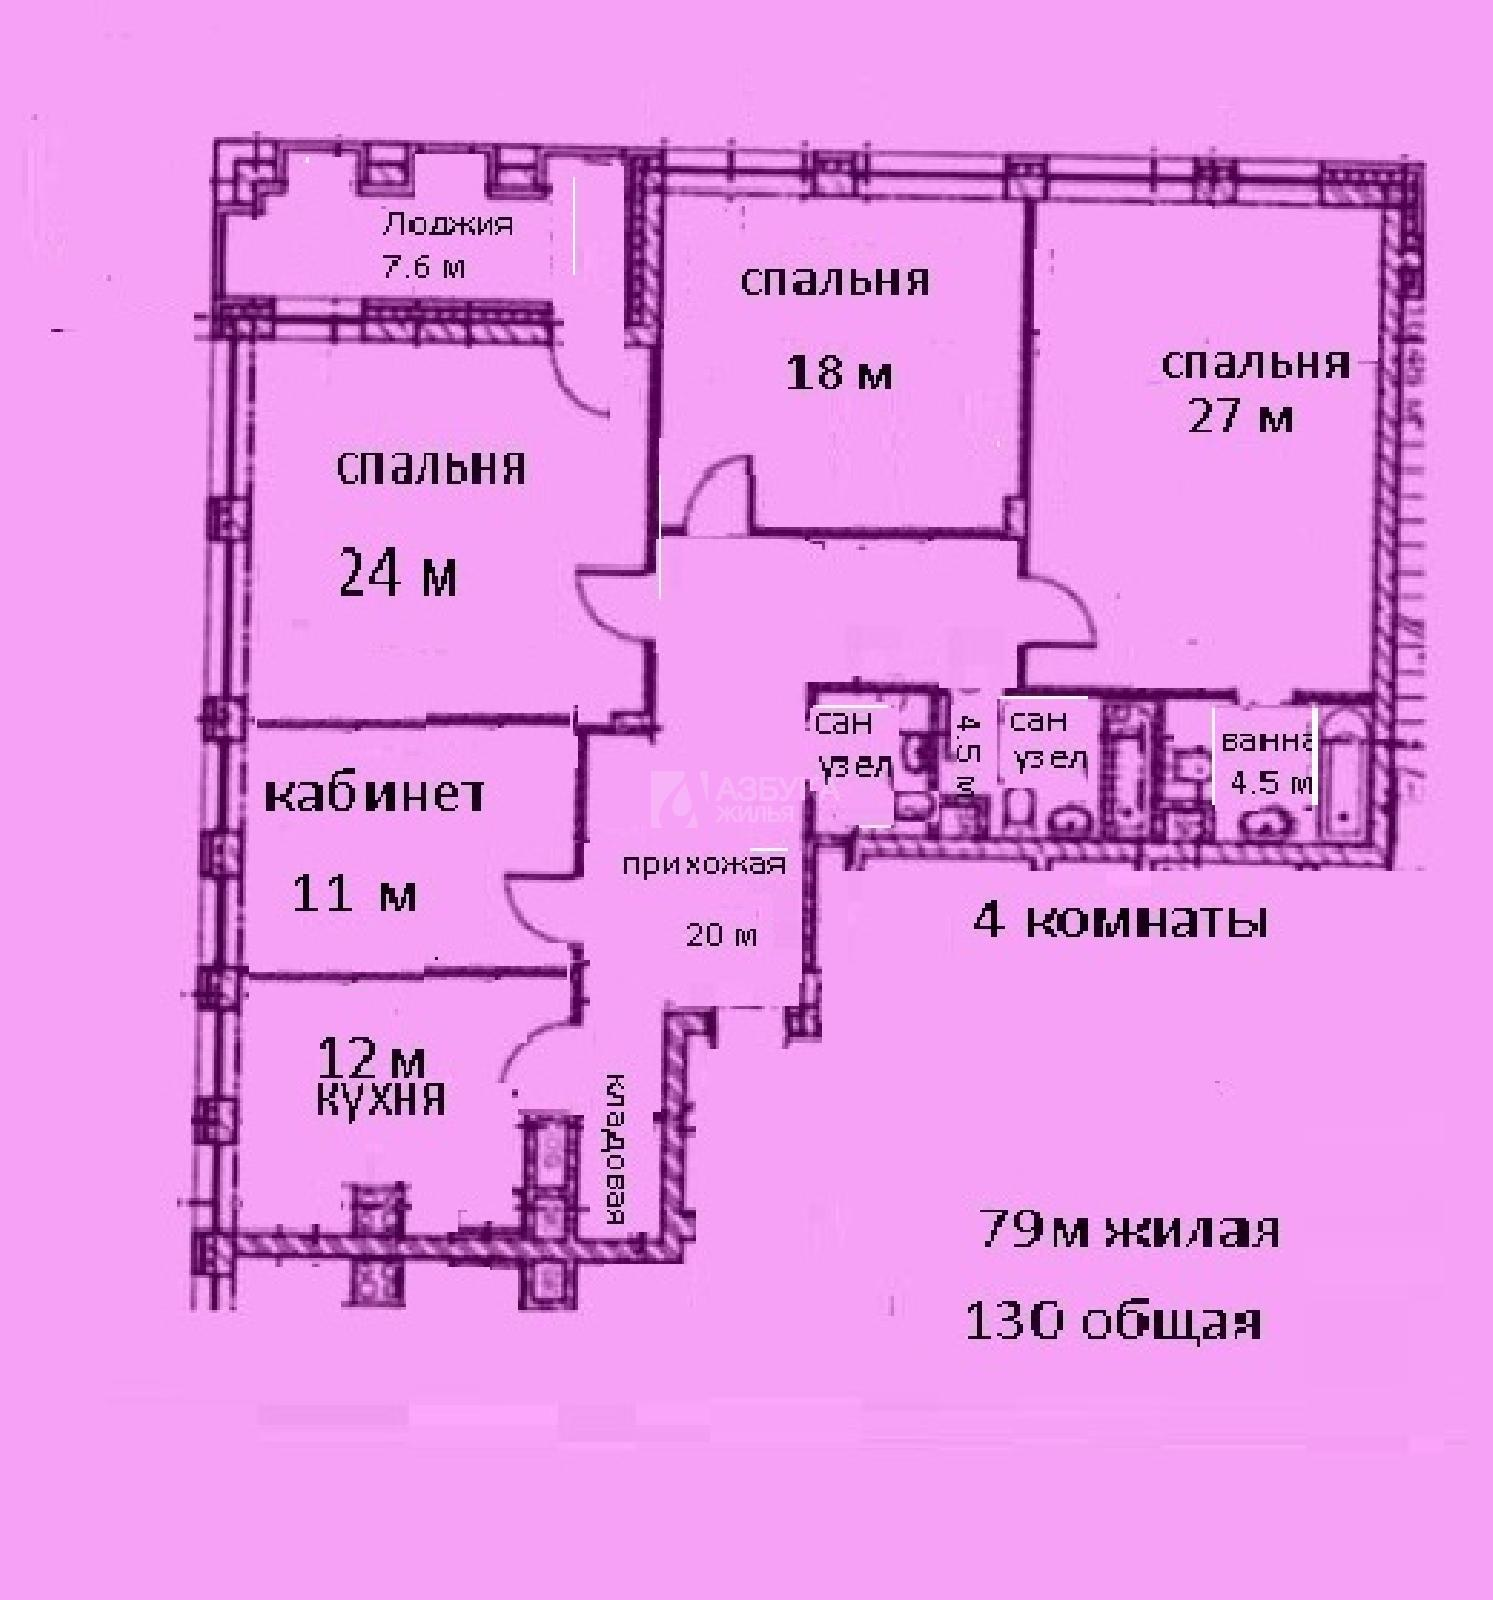 Фото №3 - 3-комнатная квартира, Москва, Усачева улица 11 корпус 2 строение 5, метро Фрунзенская